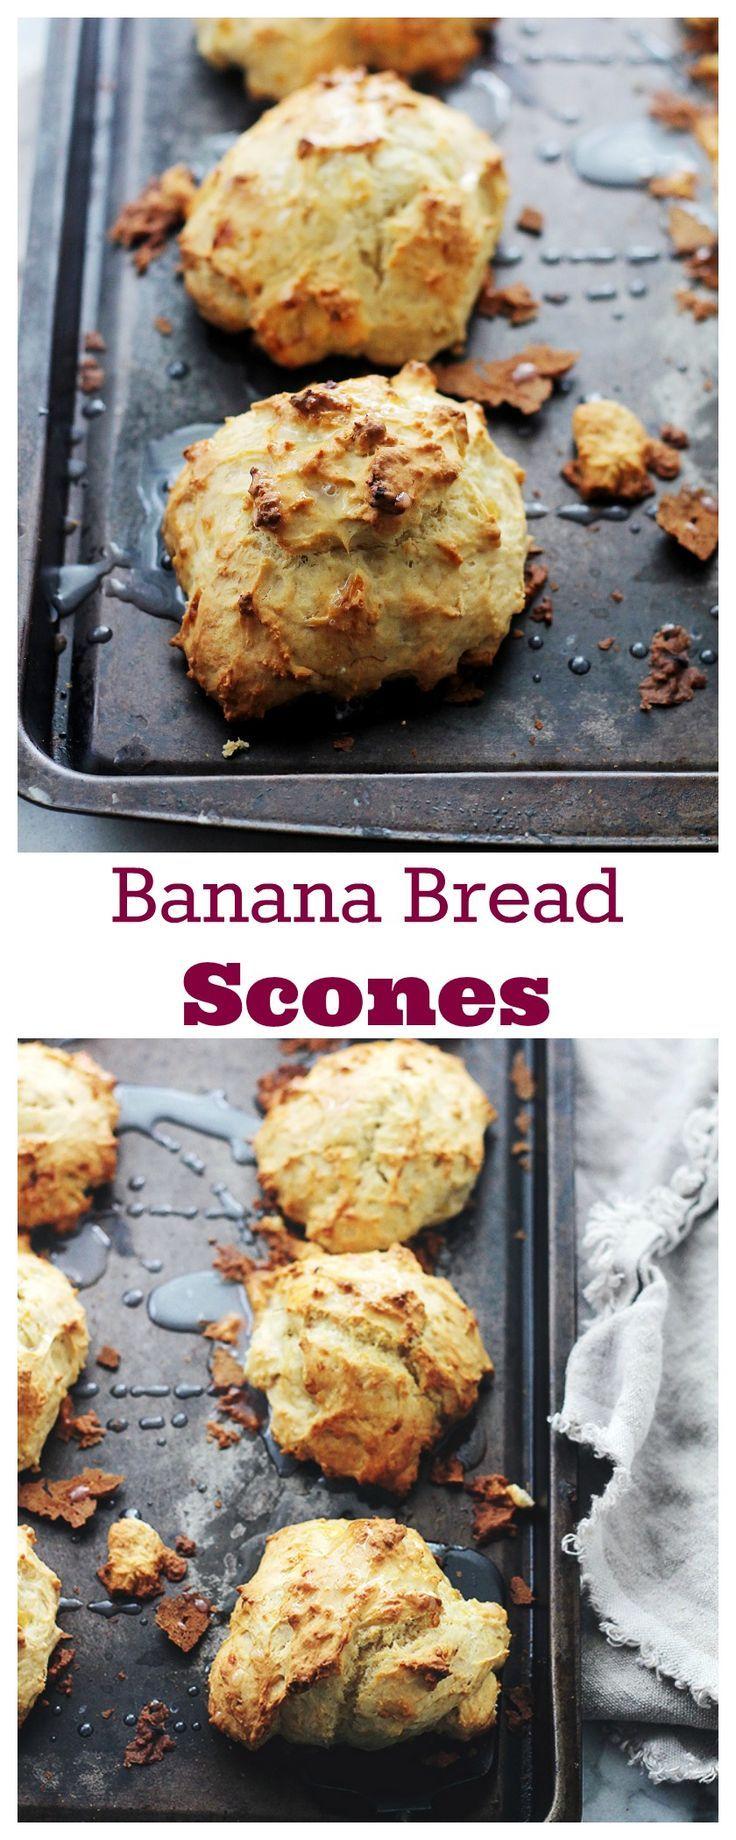 Banana Bread Scones Banana Bread Scones | www.diethood.com | The sweet ...